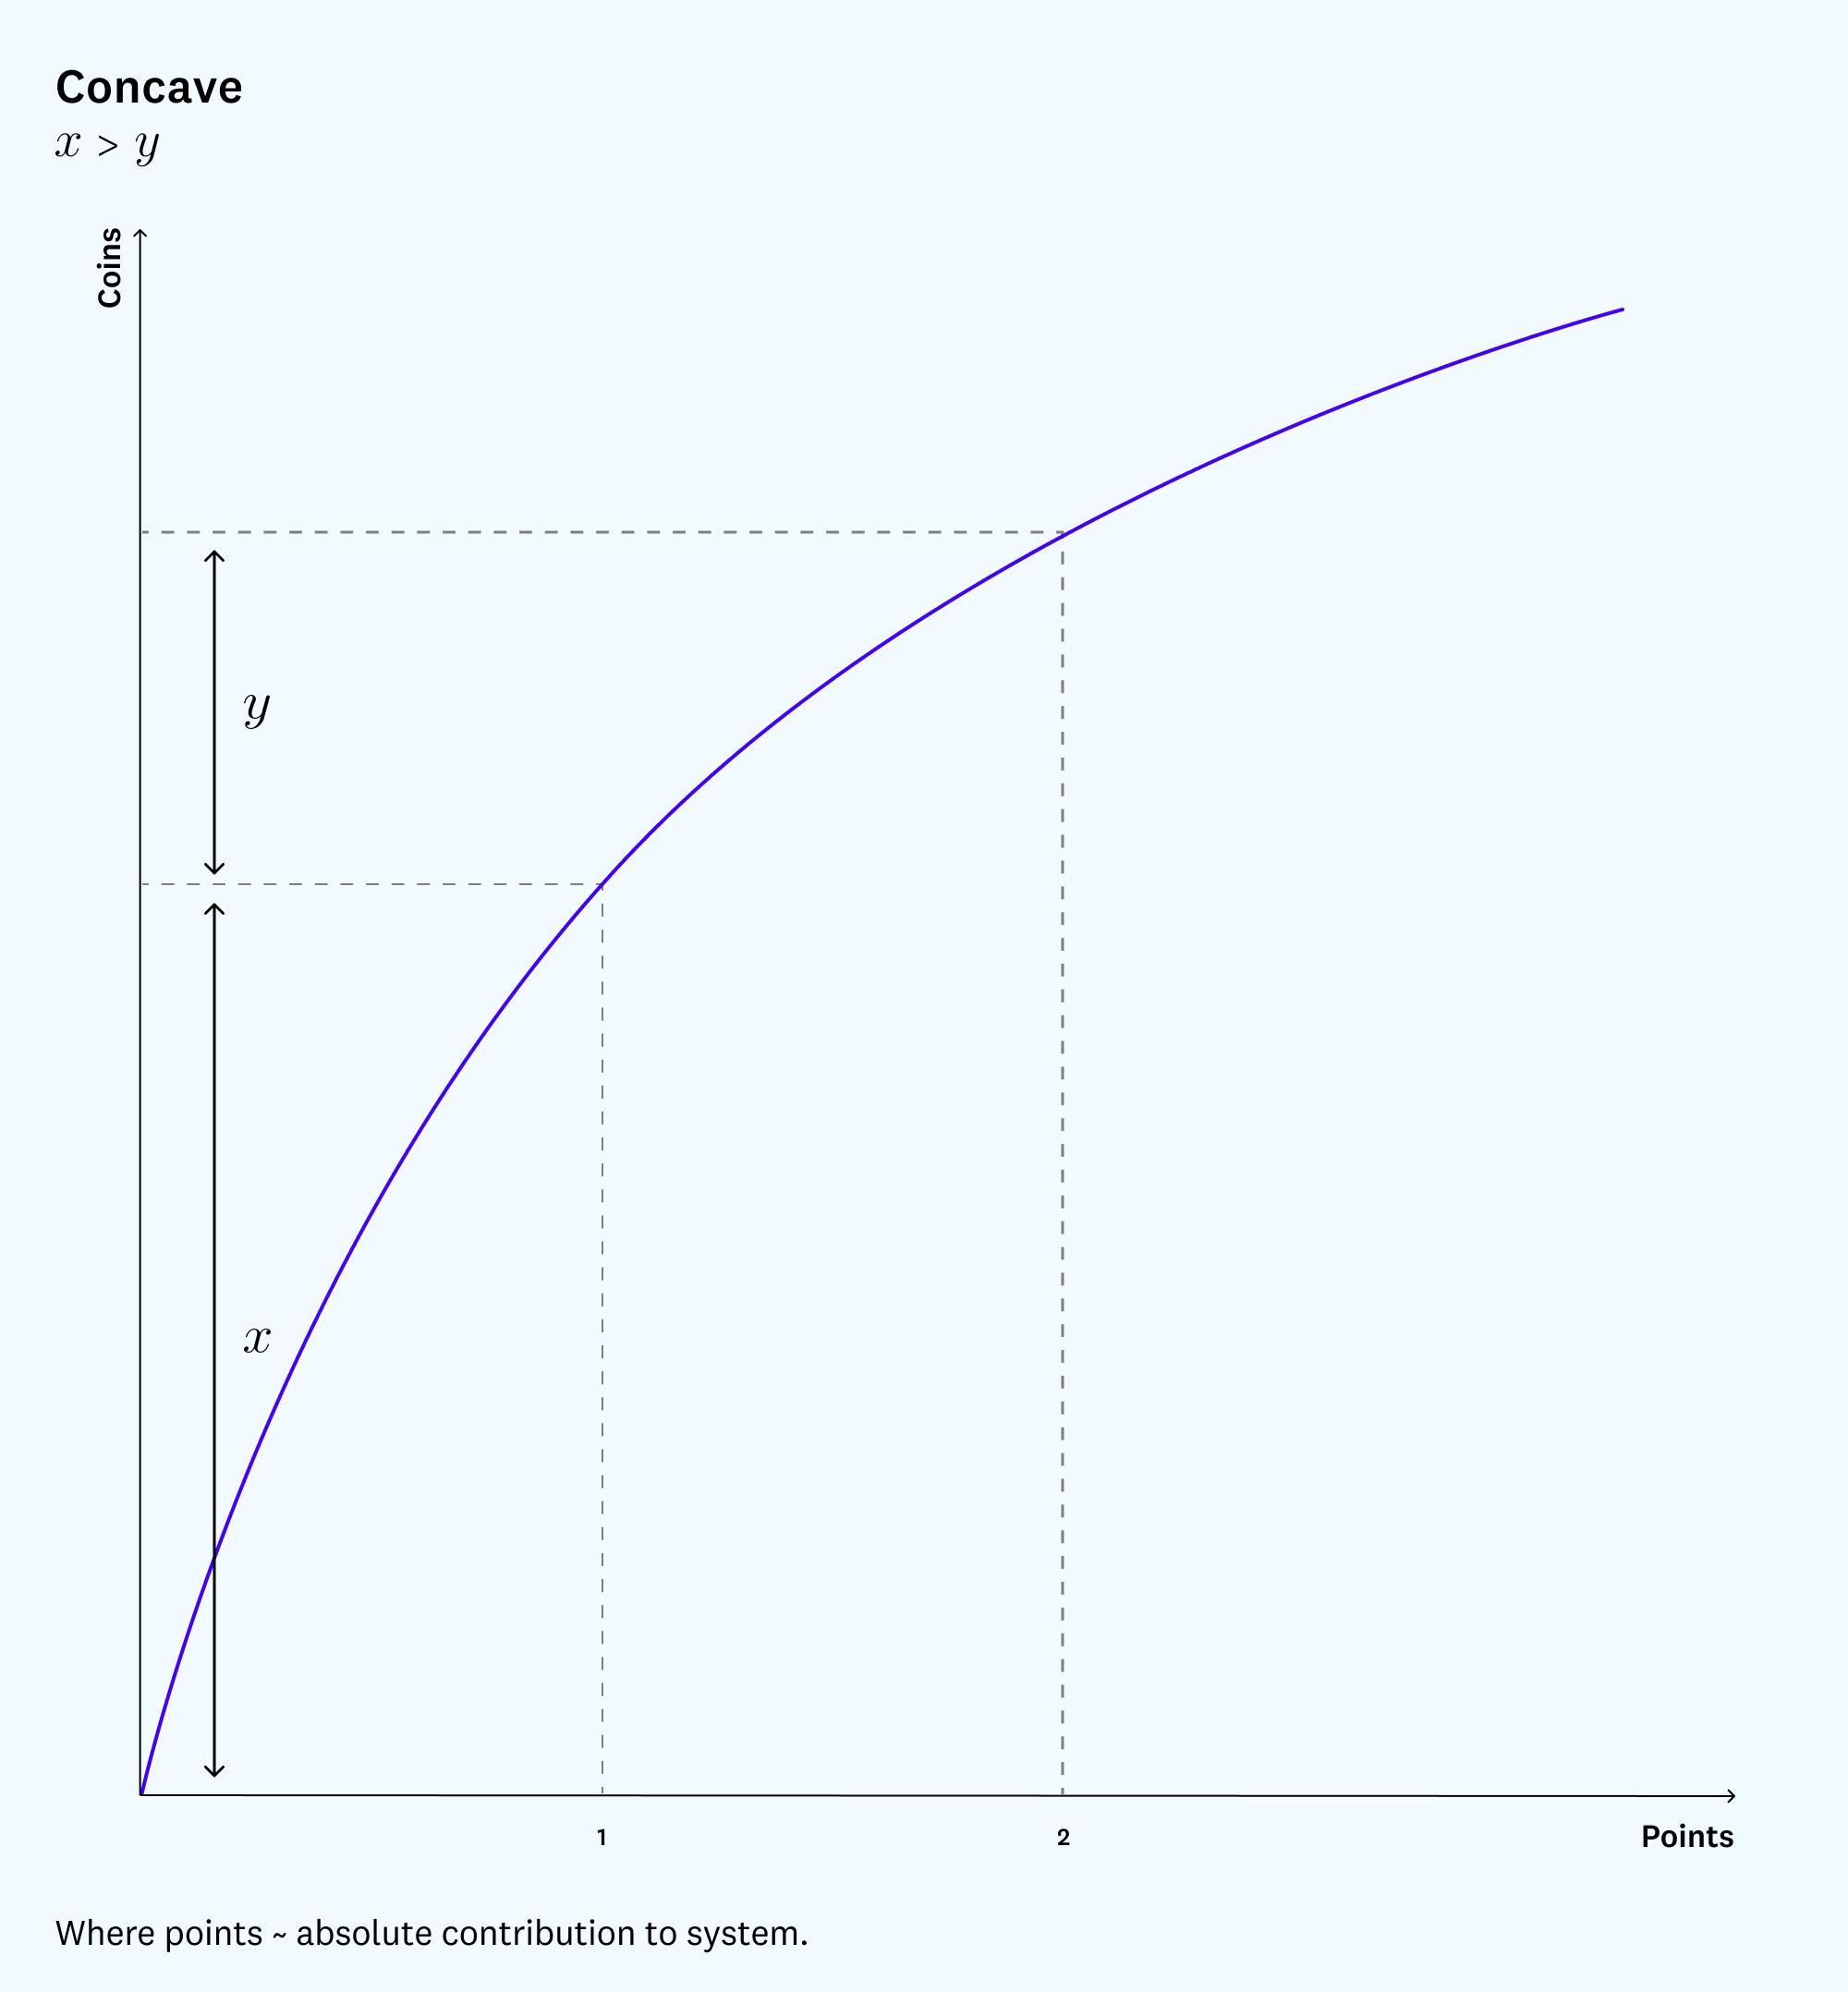 a16z: A dual-token economic model based on reputation system